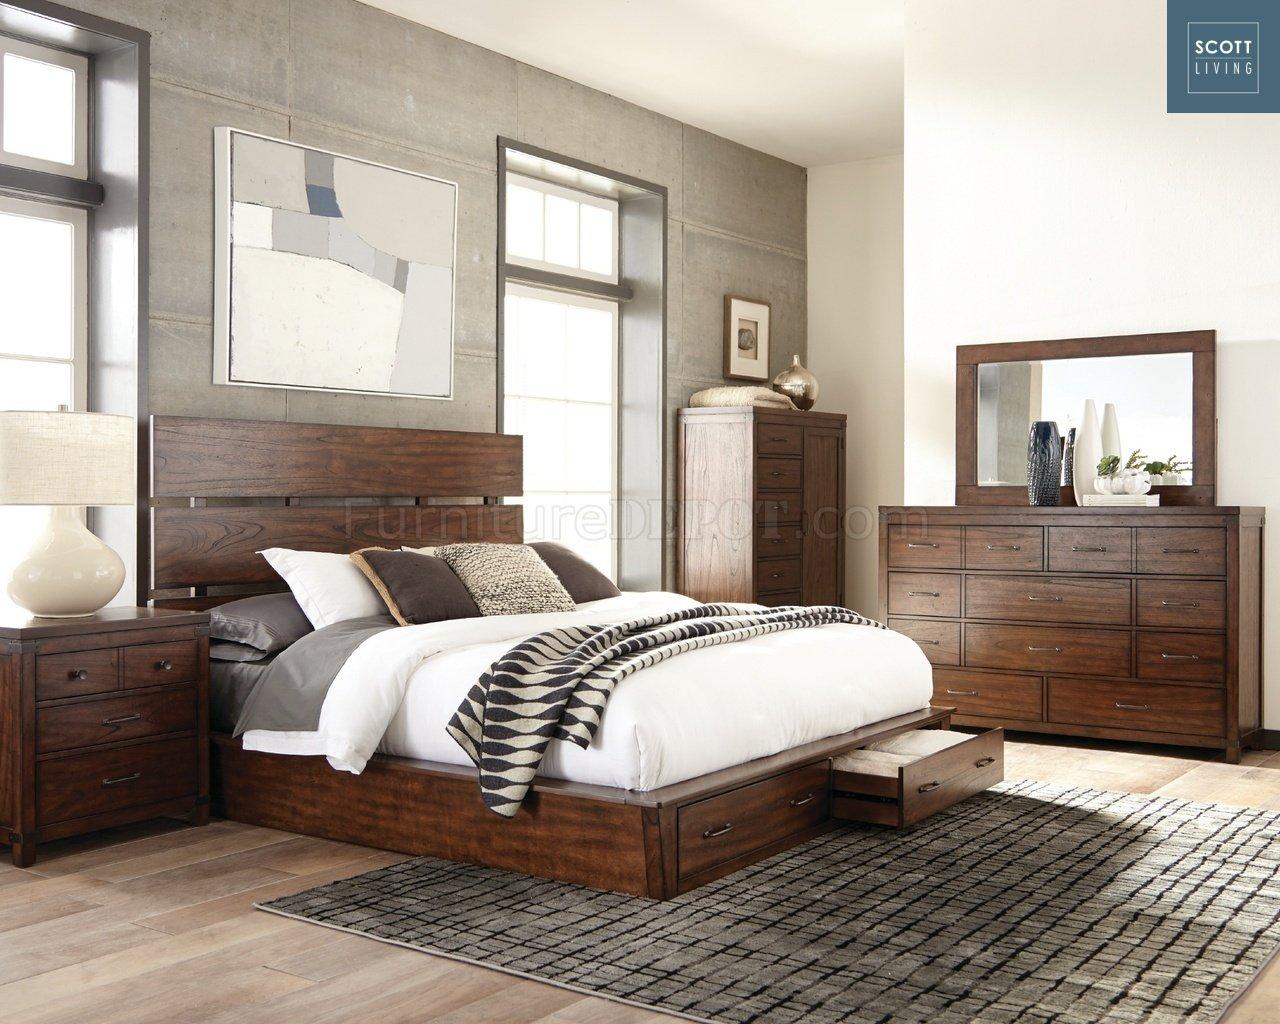 Artesia 204470 Scott Living Coaster Dark Cocoa Bedroom